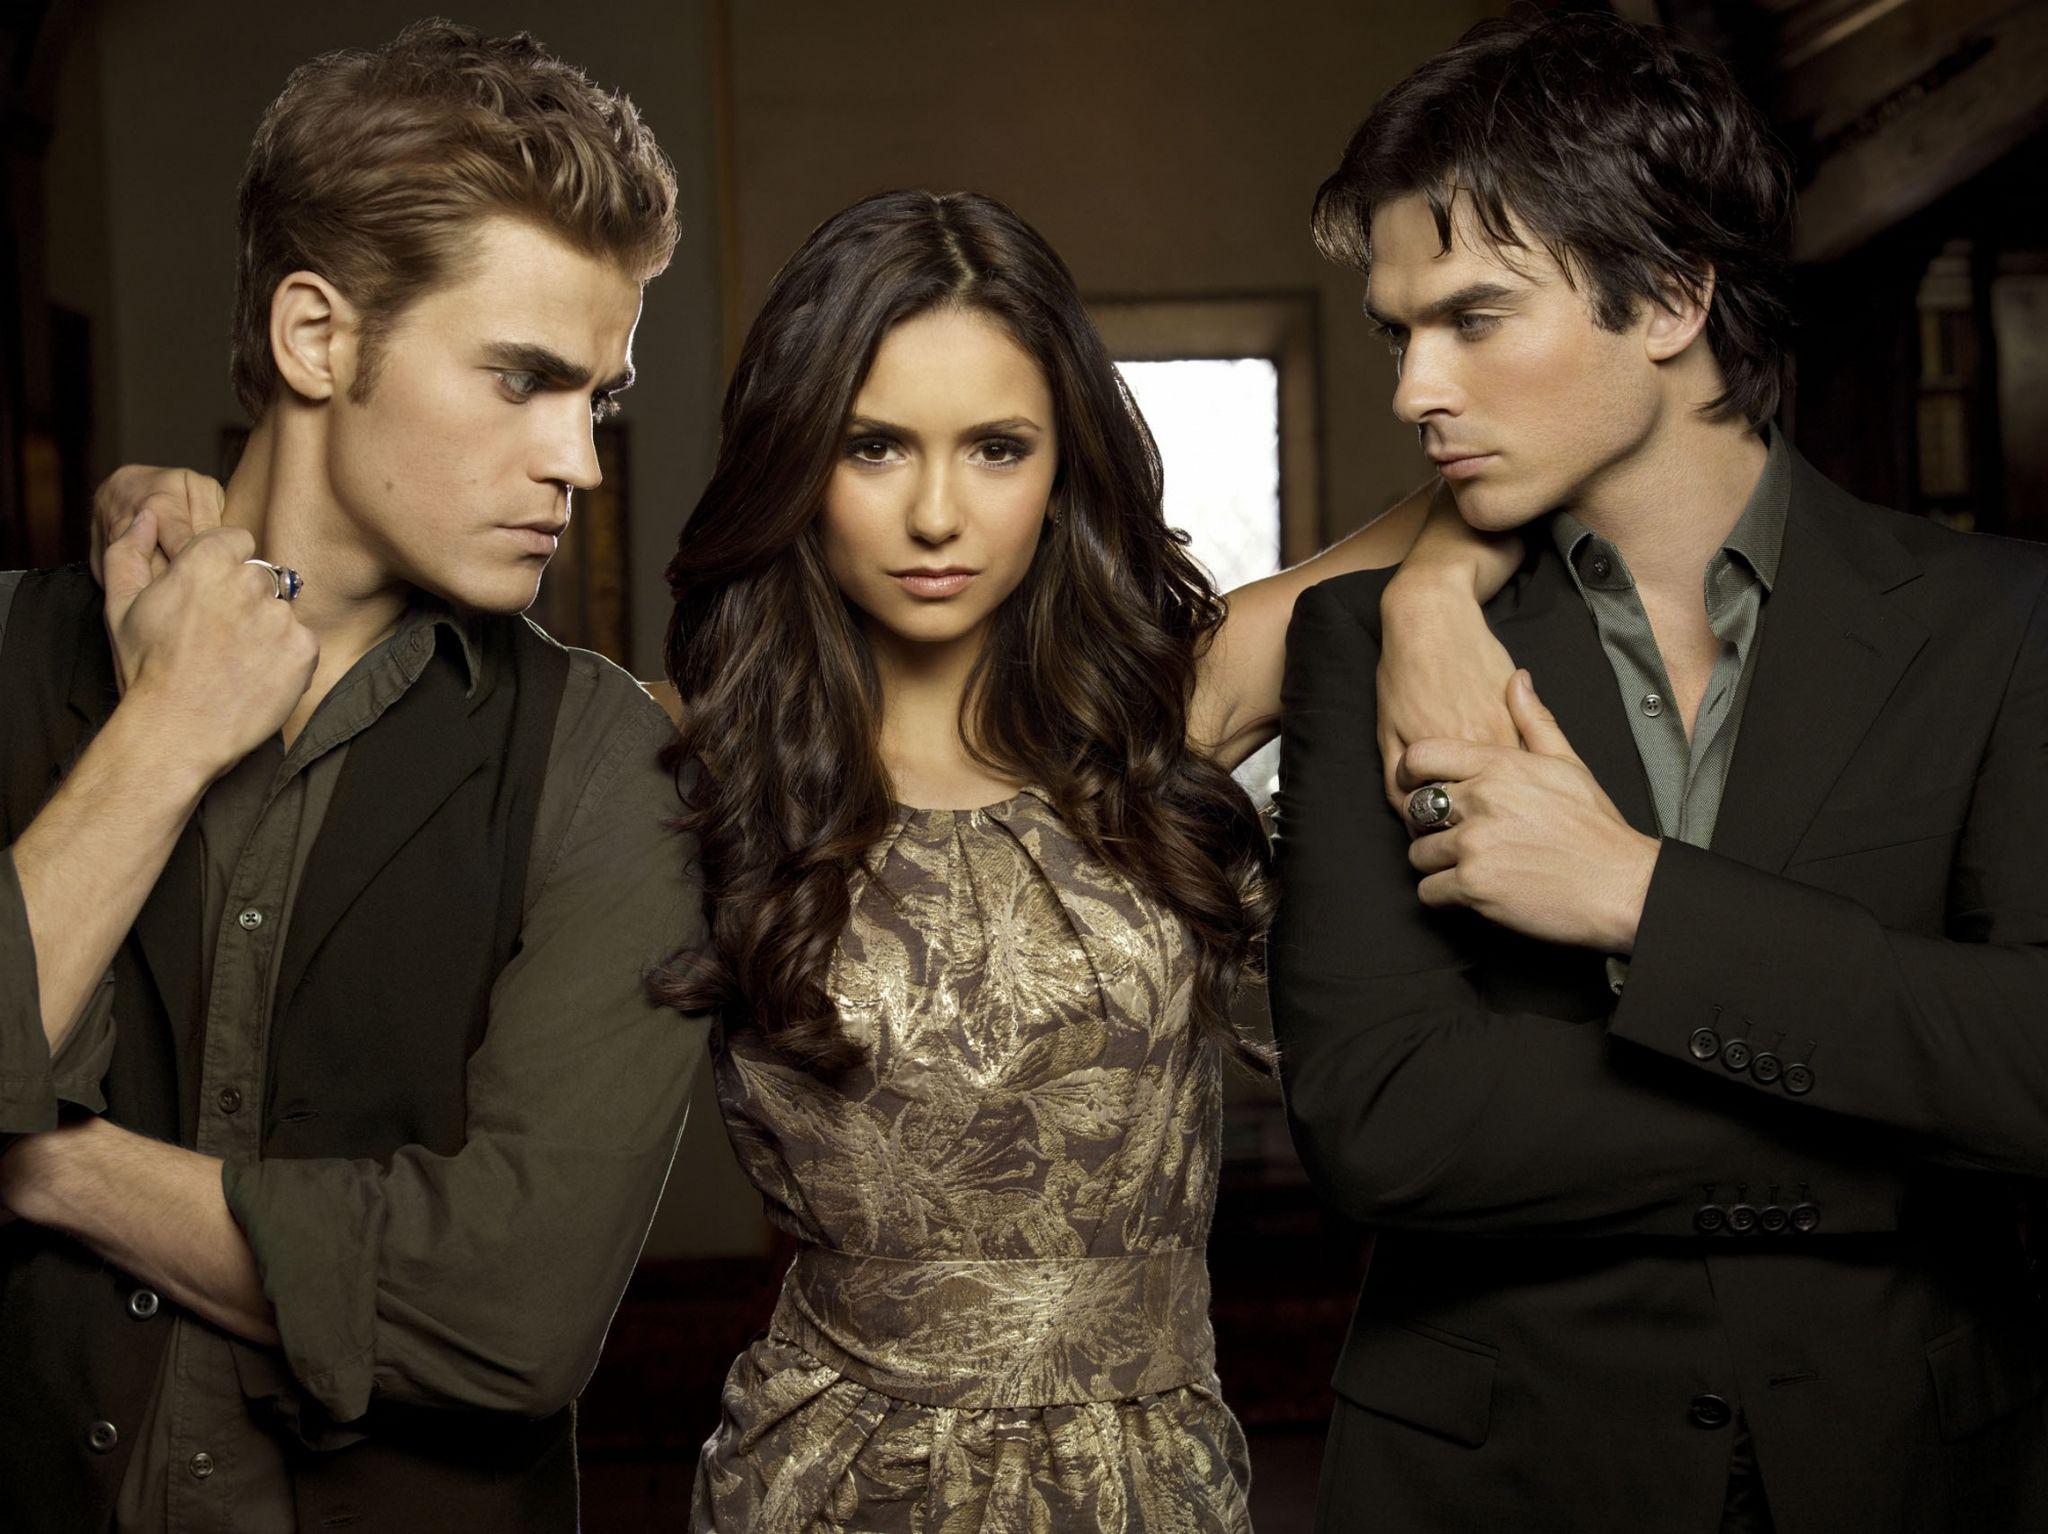 Paul Wesley, Nina Dobrev and Ian Somerhalder as Stefan, Elena and Damon